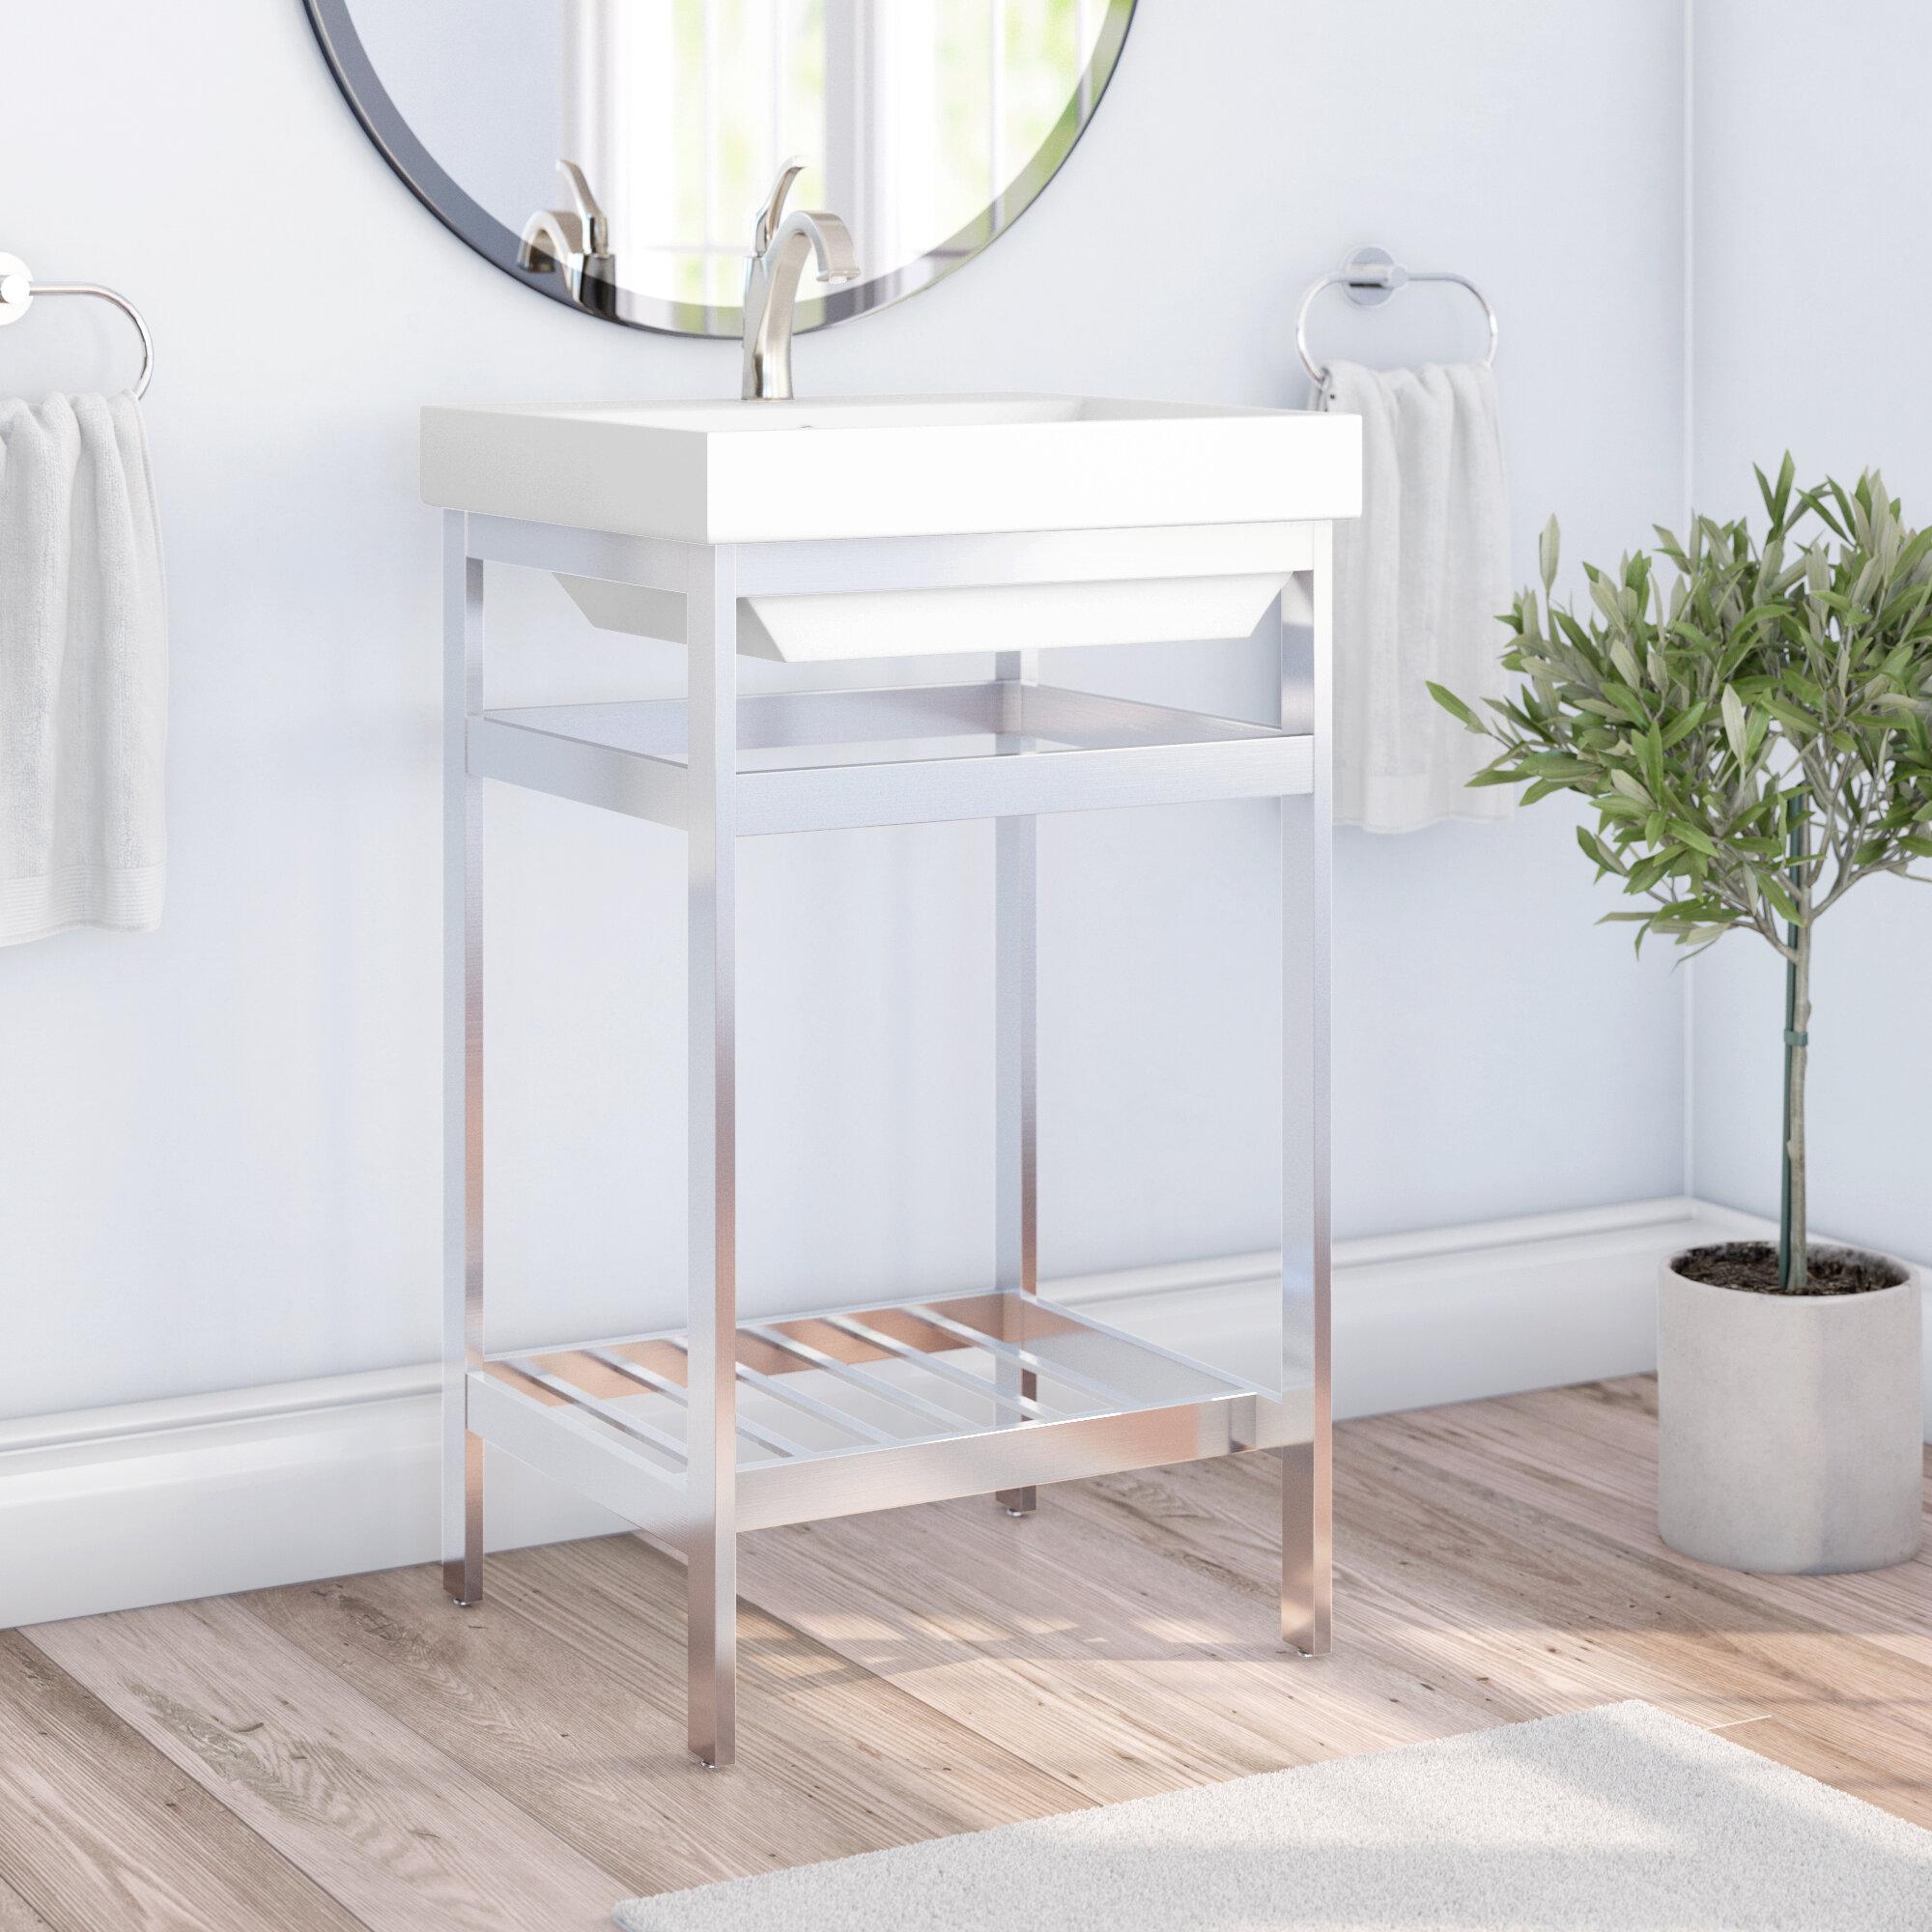 Latitude Run Burnsdale Stainless Steel Open Console 20 Single Bathroom Vanity Set Wayfair